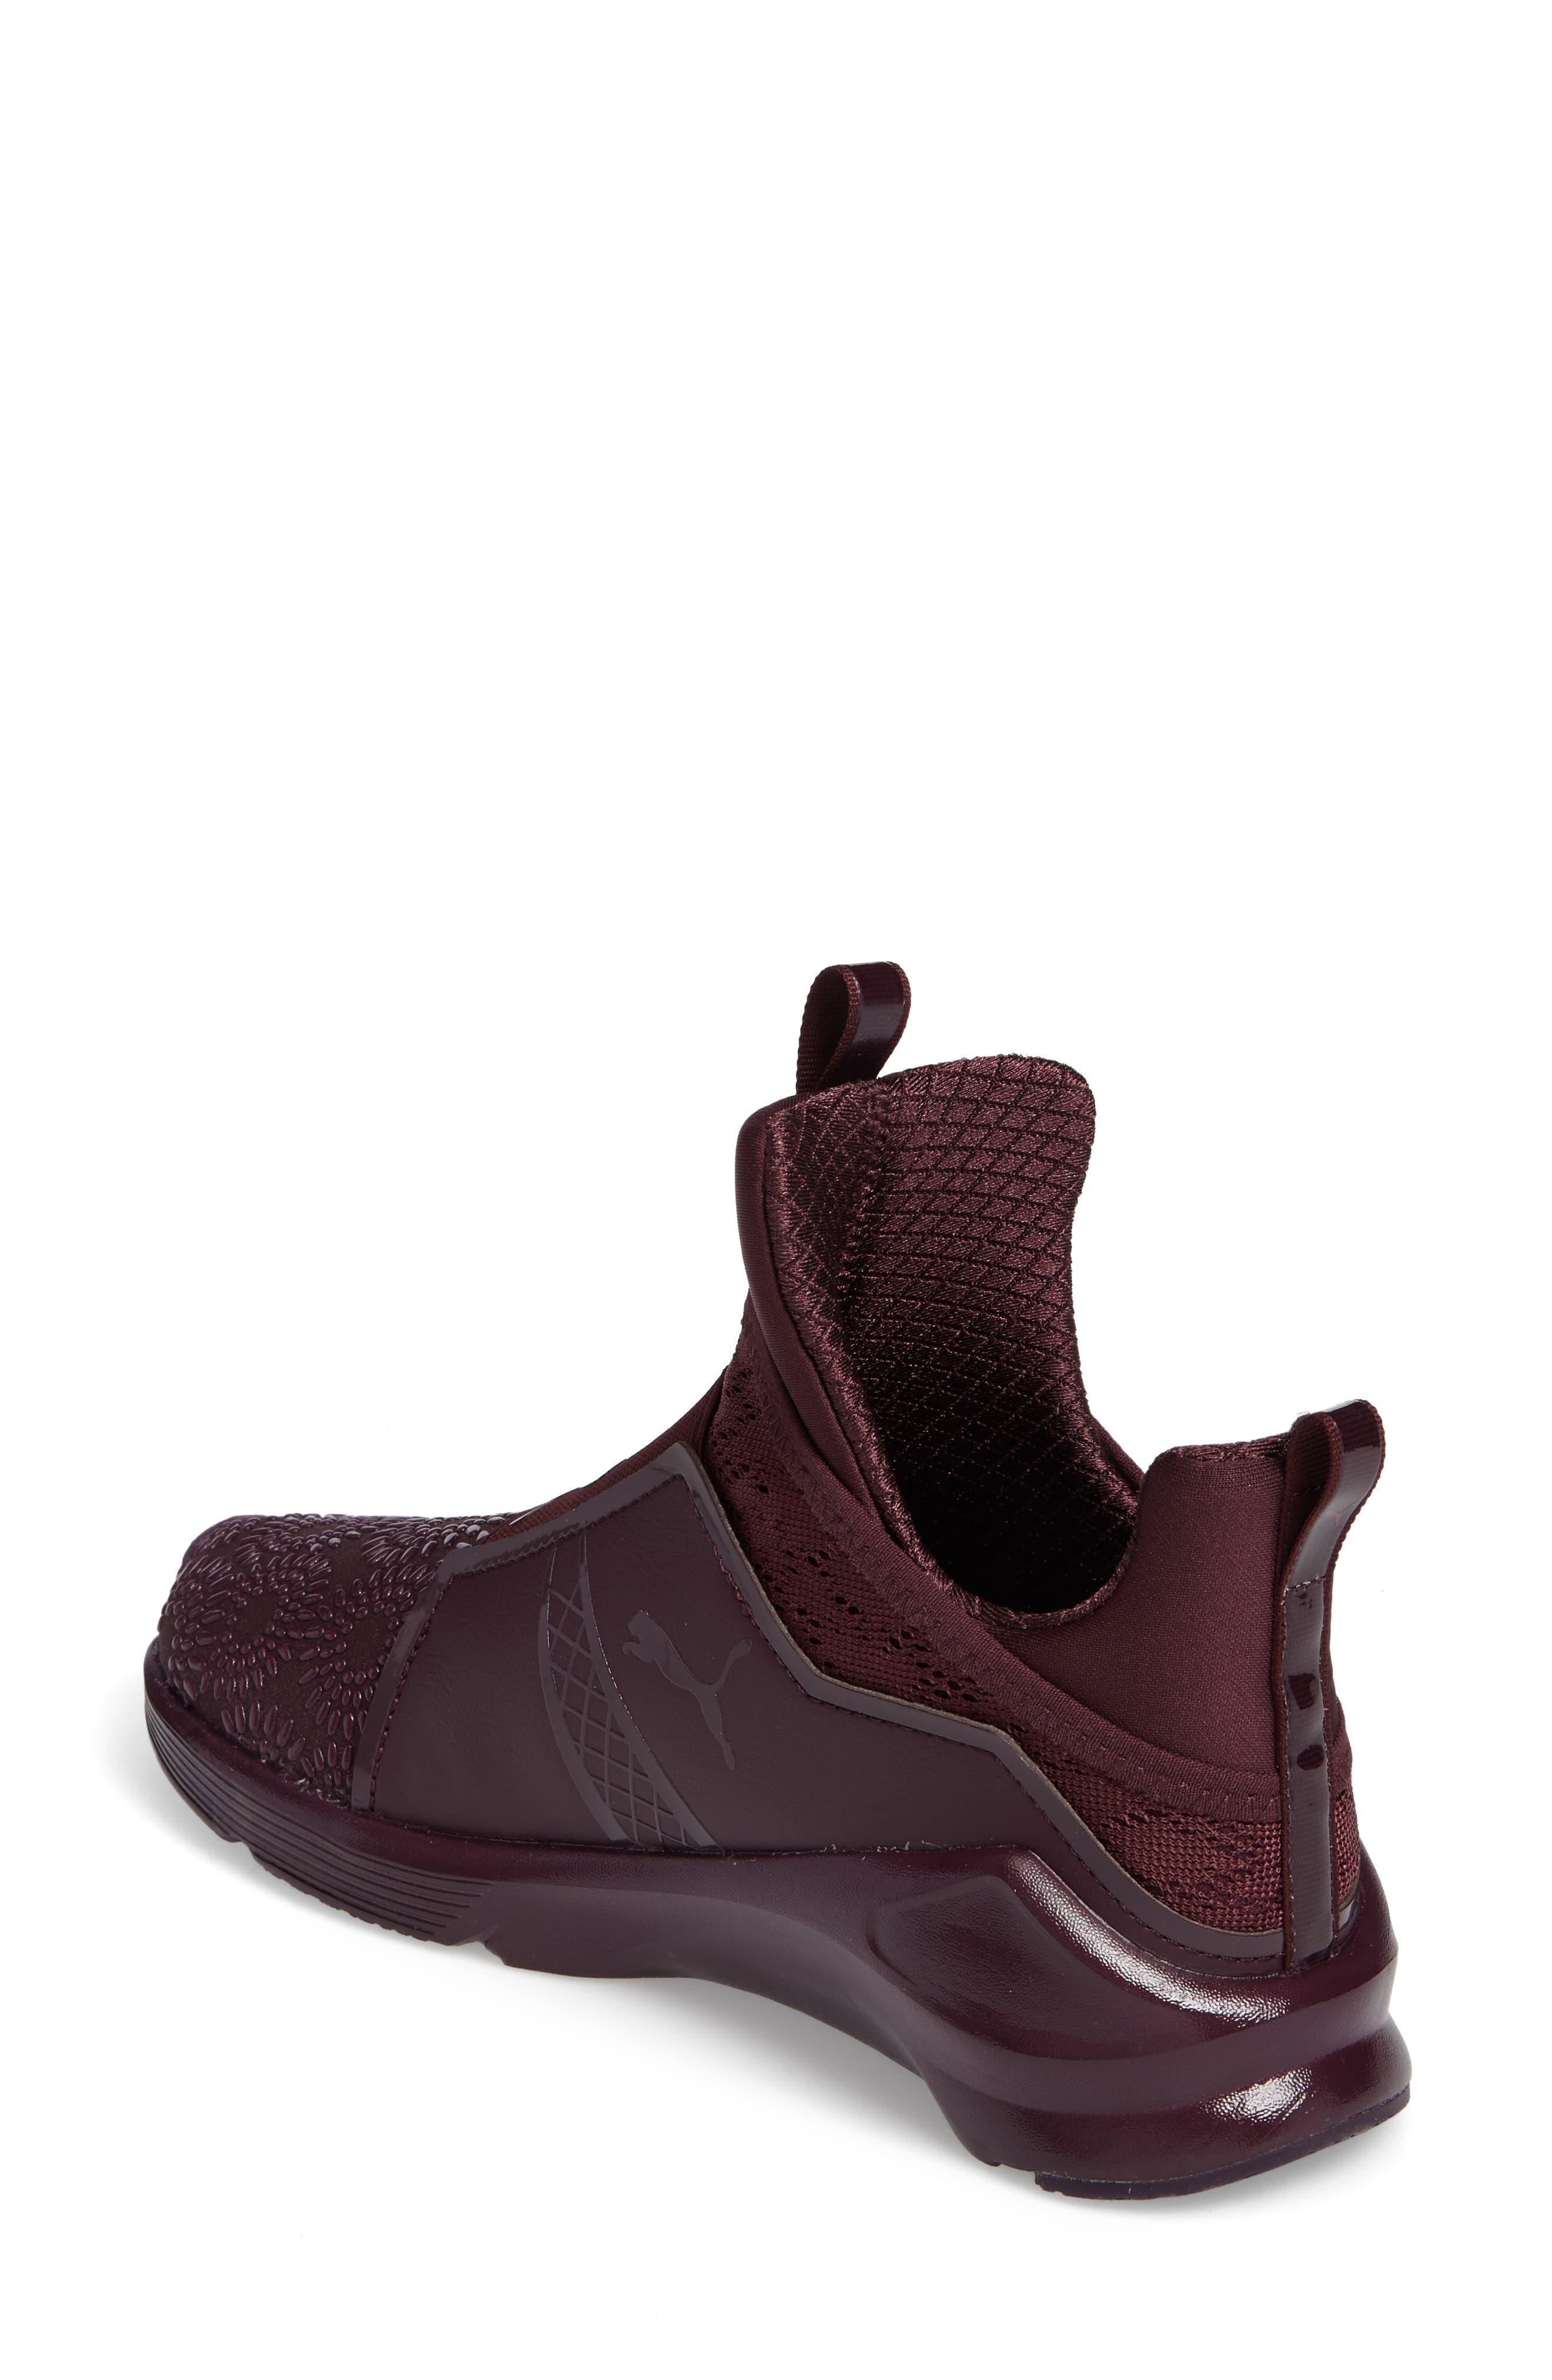 Fierce KRM High Top Sneaker,                             Alternate thumbnail 6, color,